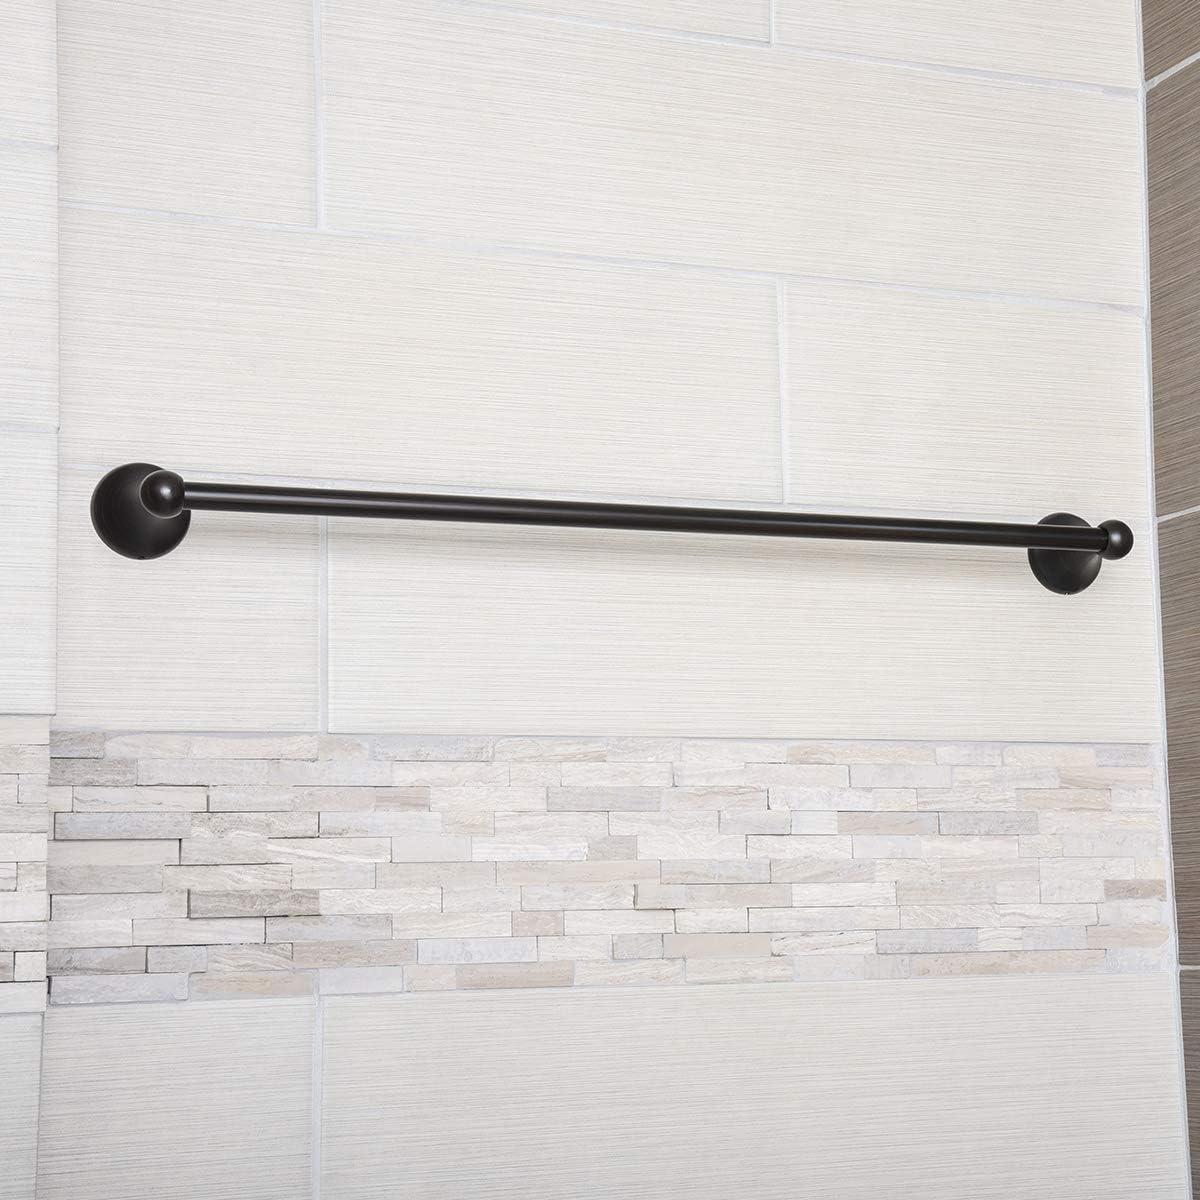 Basics Toallero de barra cromo pulido estilo est/ándar 45,7/cm